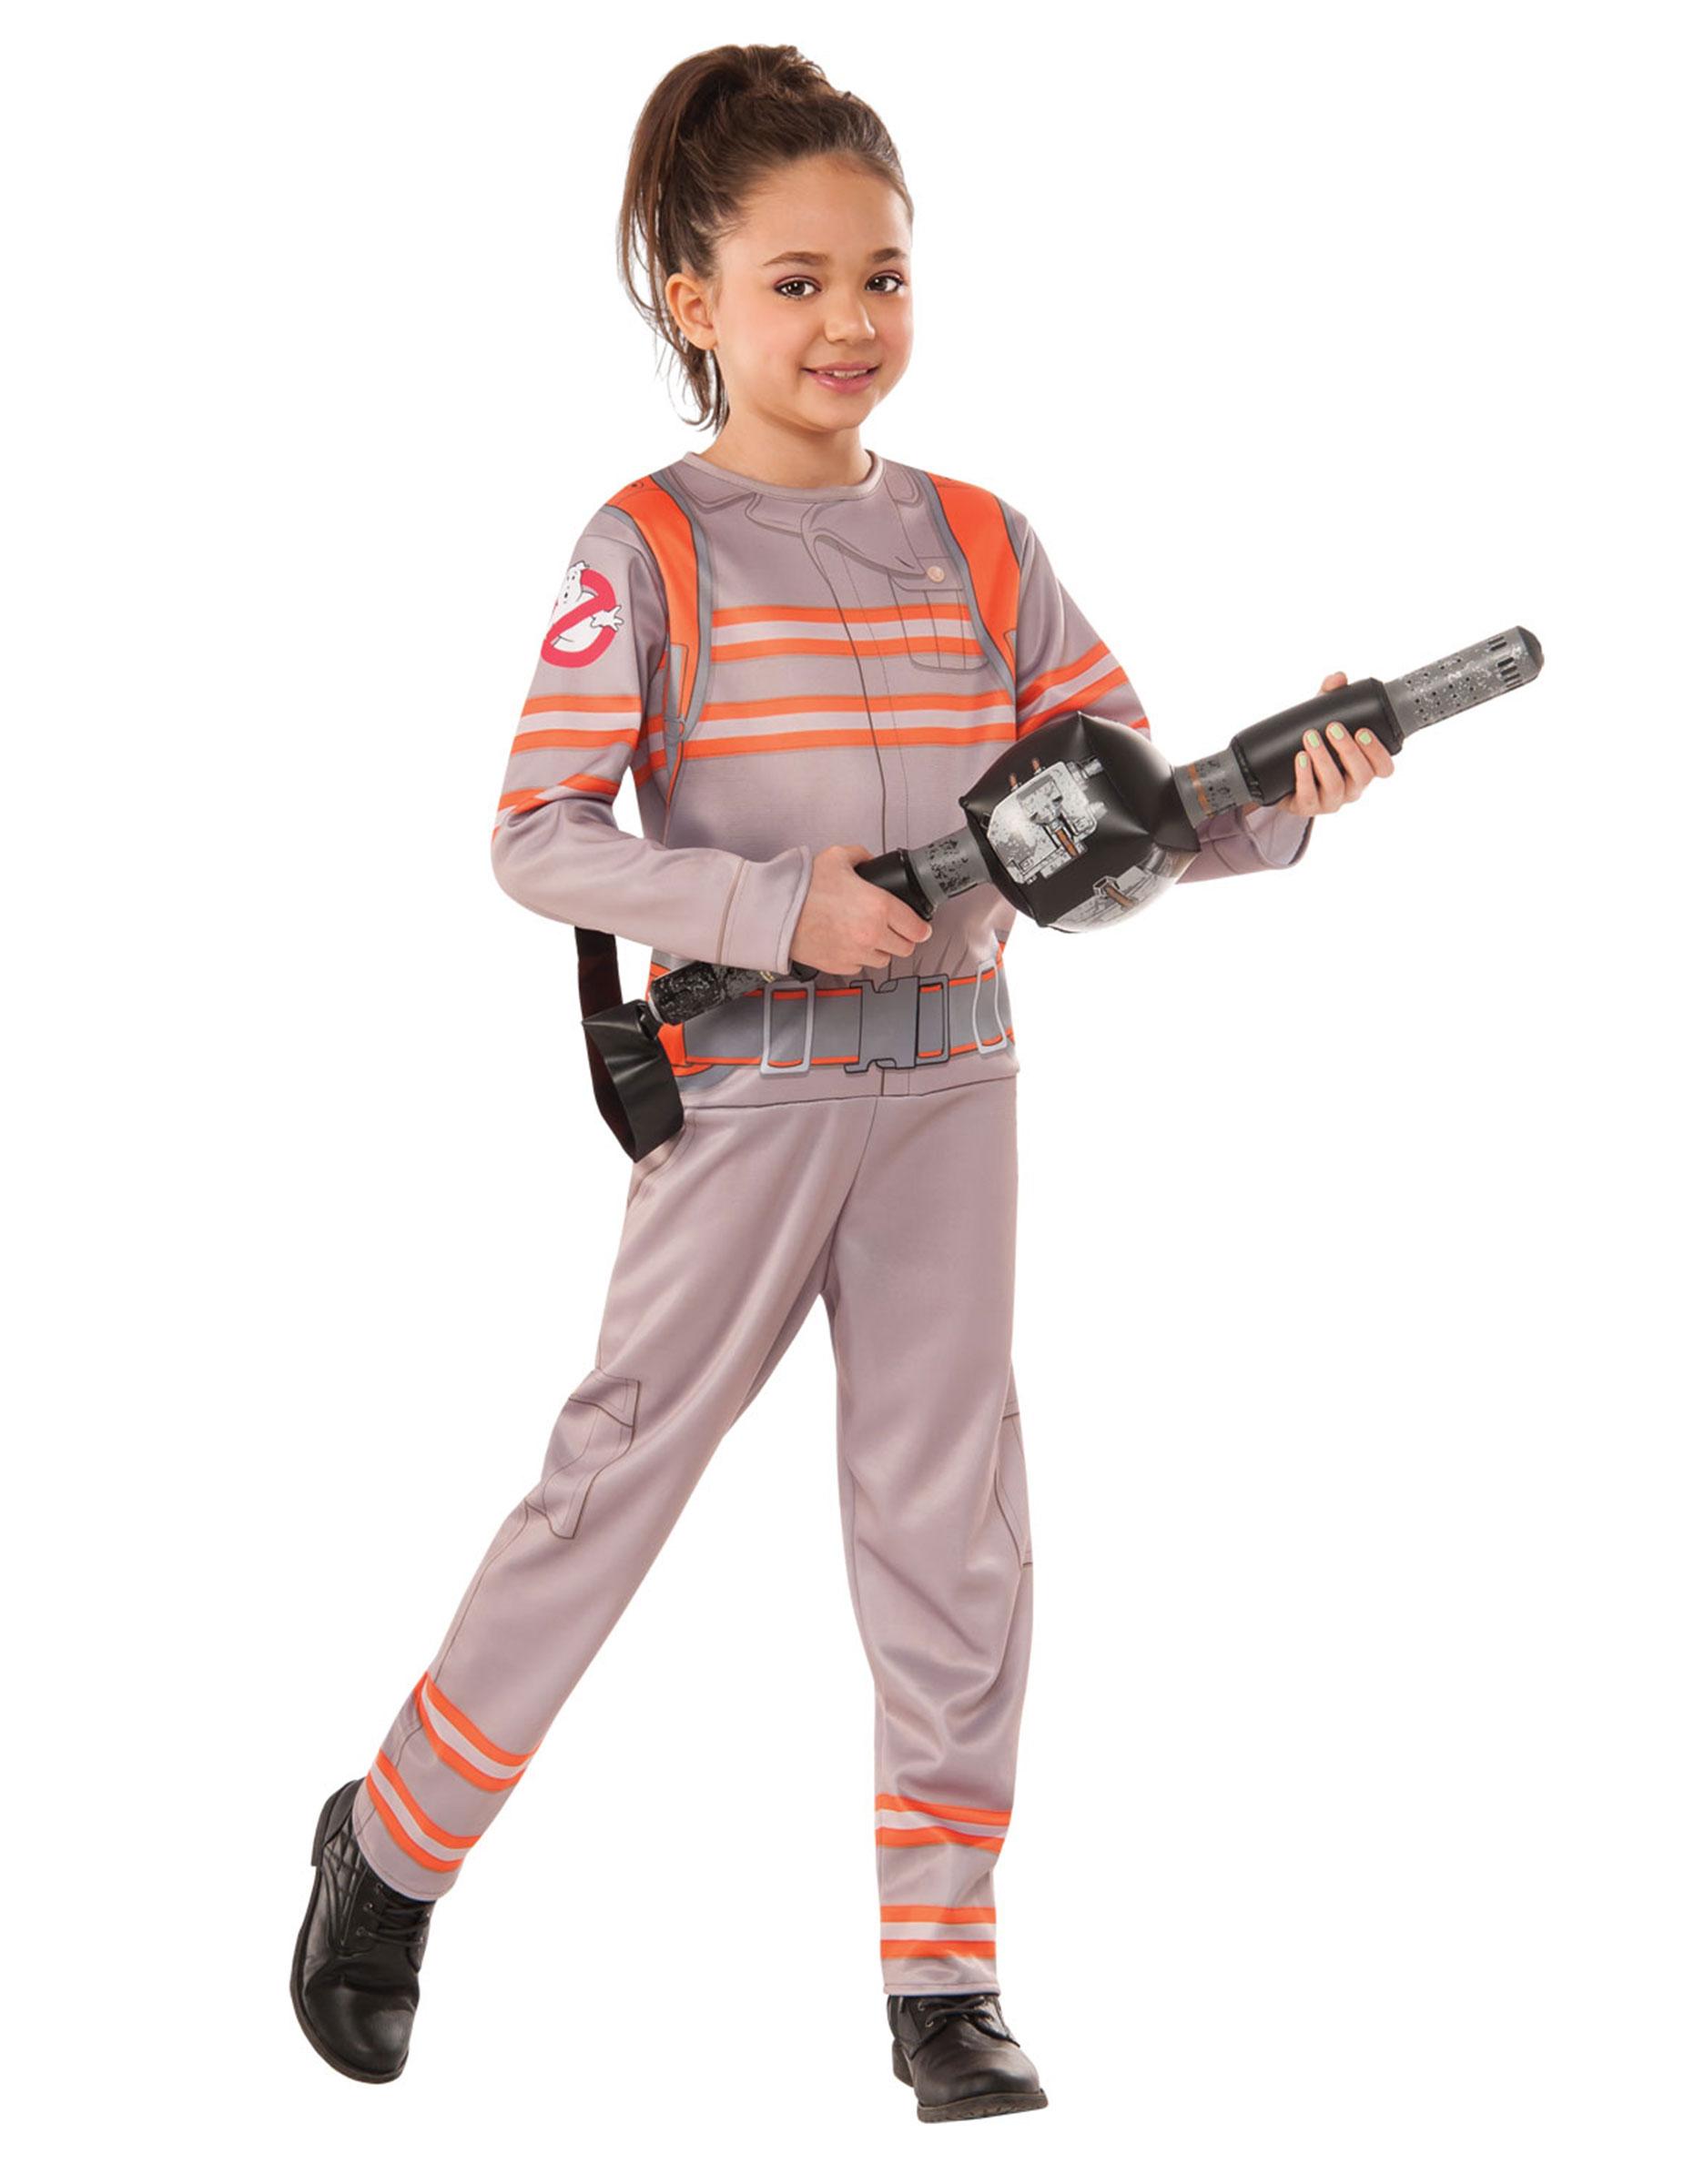 ghostbusters kinderkost m mit spielzeugwaffe grau orange kost me f r kinder und g nstige. Black Bedroom Furniture Sets. Home Design Ideas